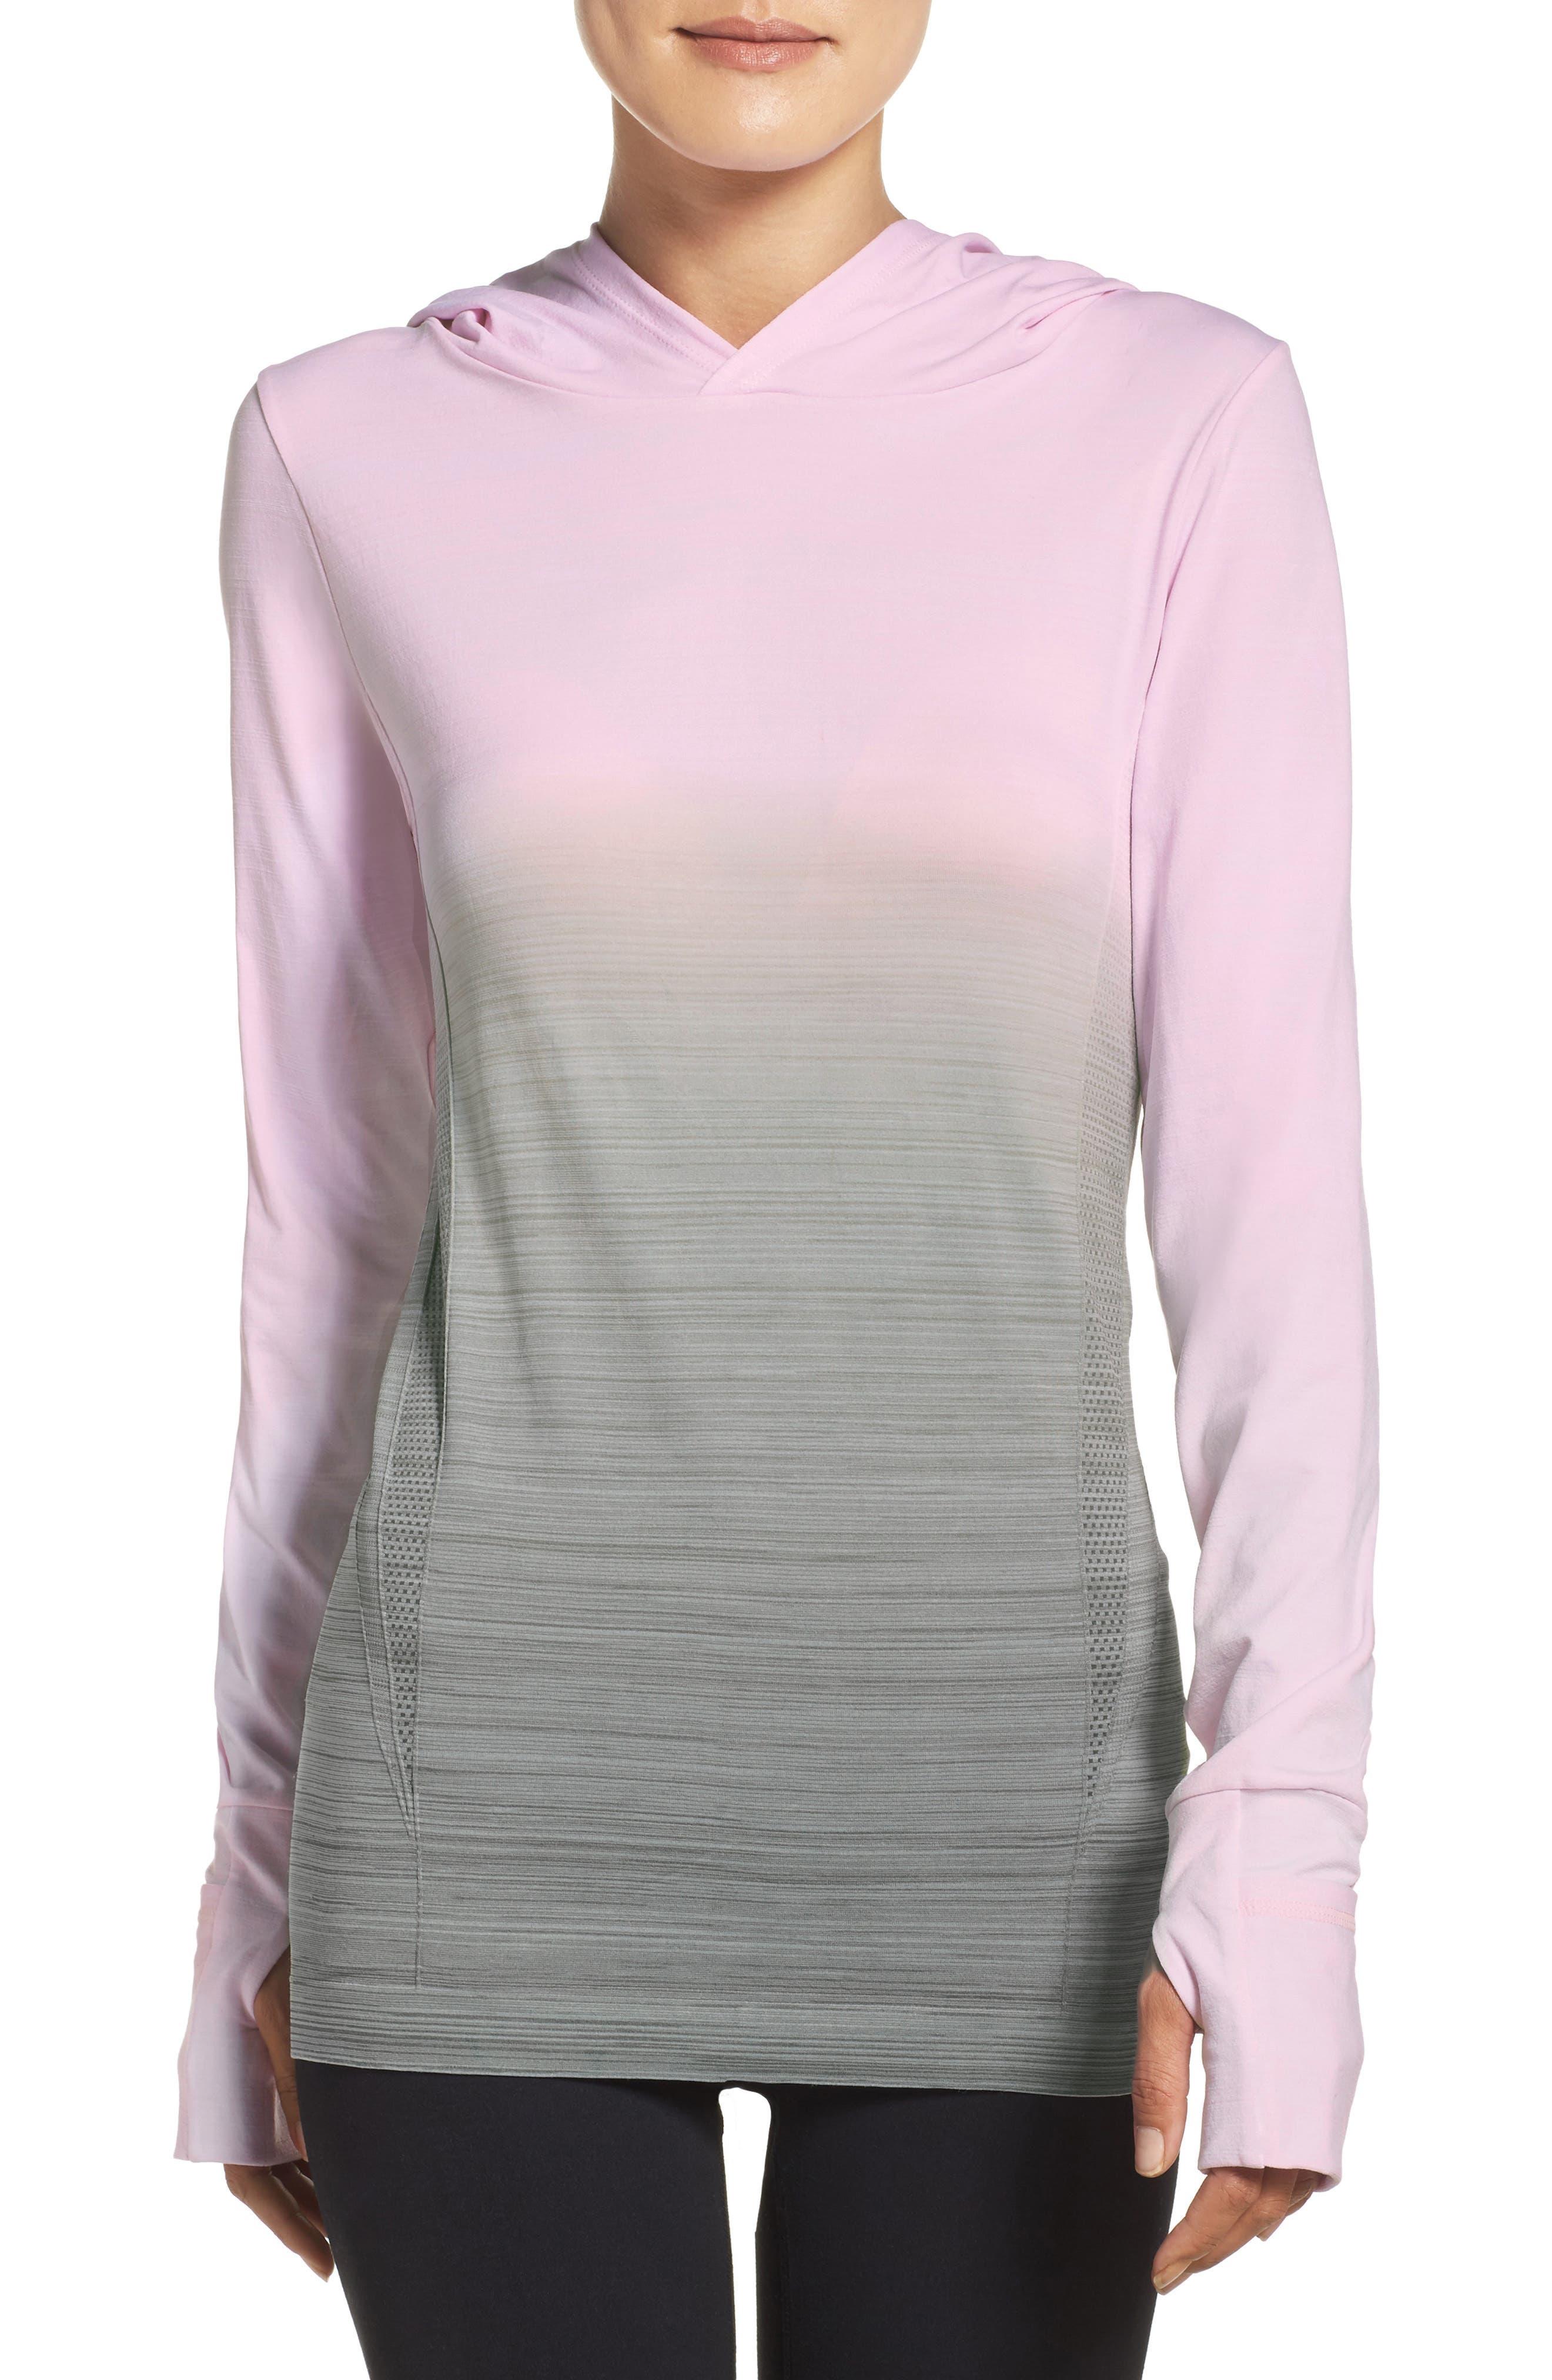 Smitten Hoodie,                         Main,                         color, Cradle Pink/ Olive